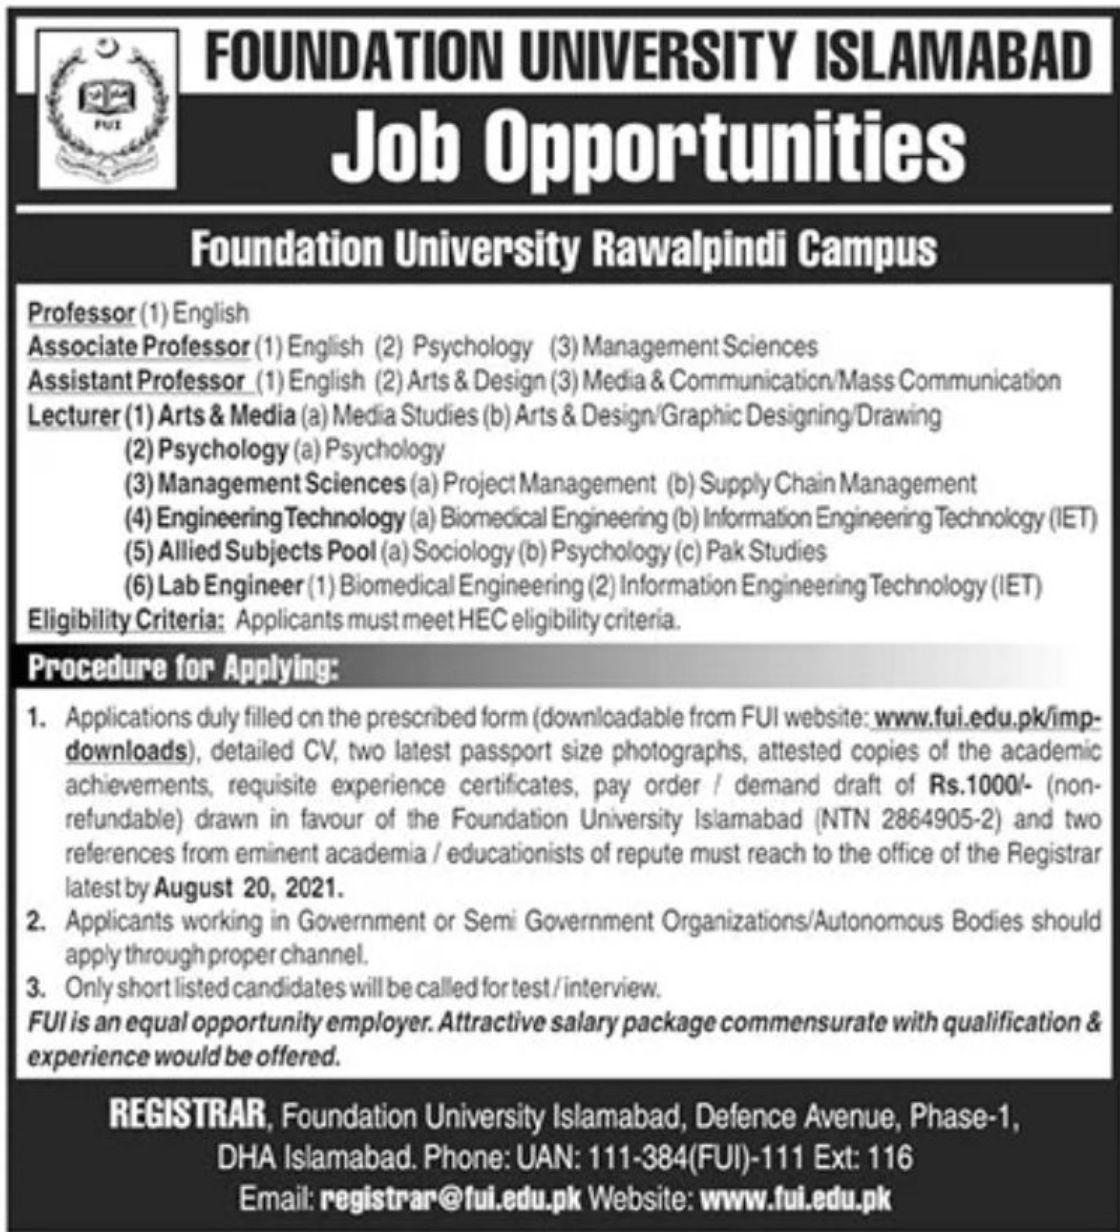 Foundation University Islamabad Vacancies 2021 2